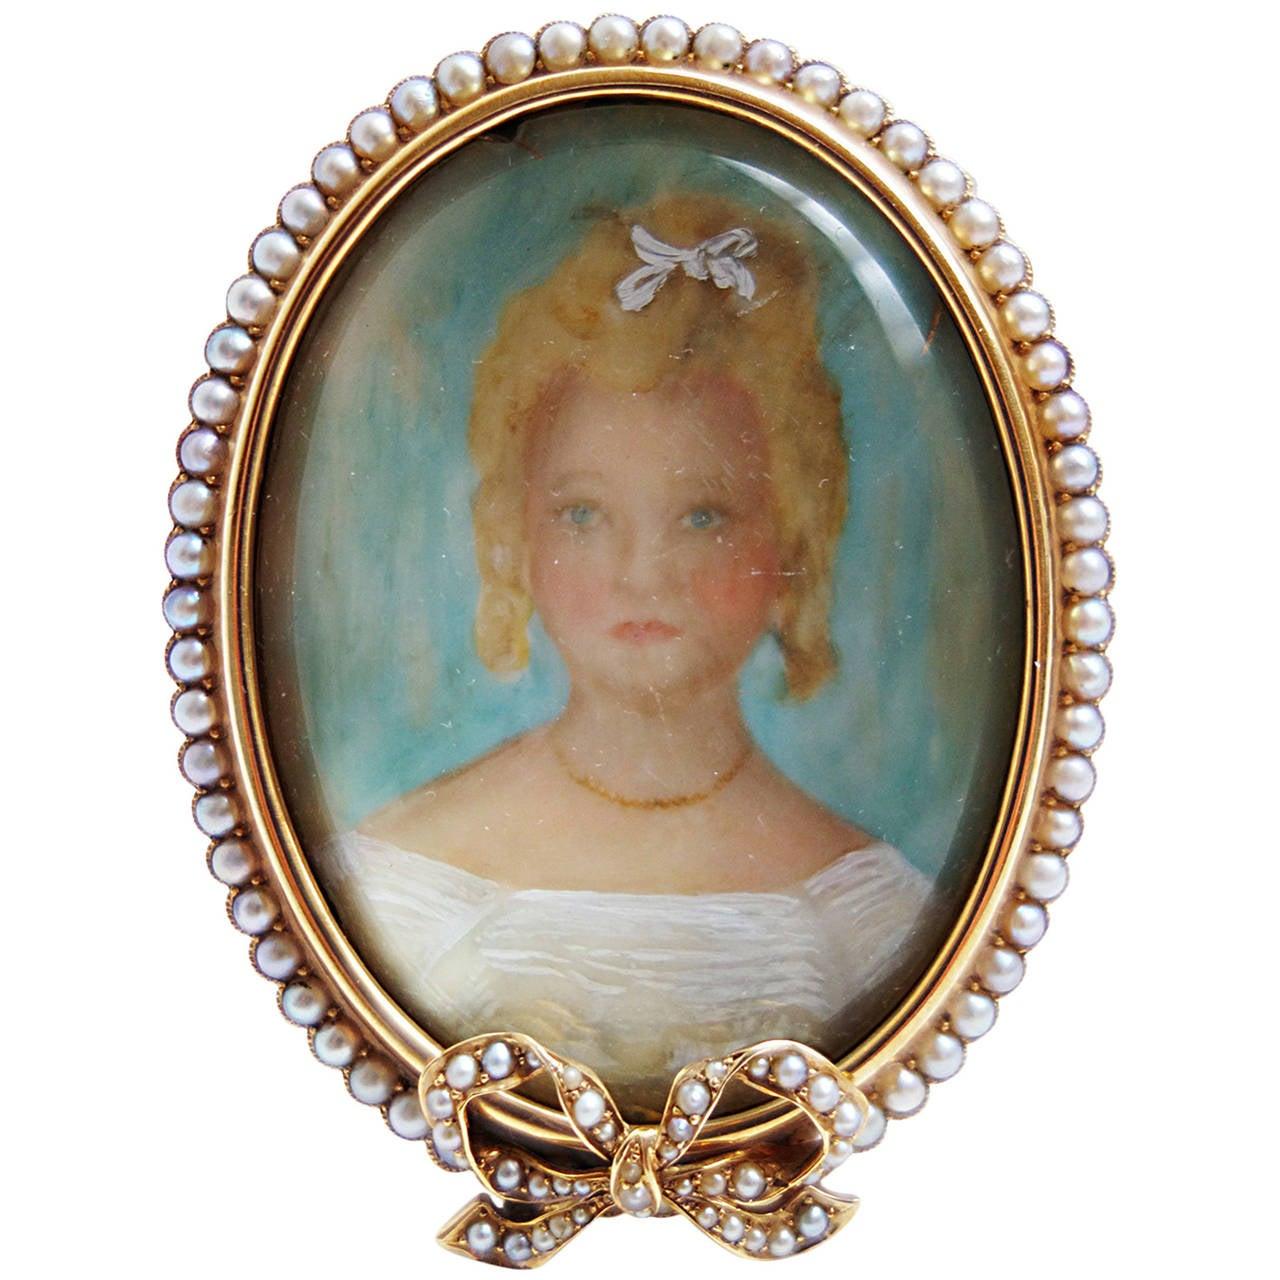 Antique Pearl Gold Portrait Miniature Picture Frame For Sale